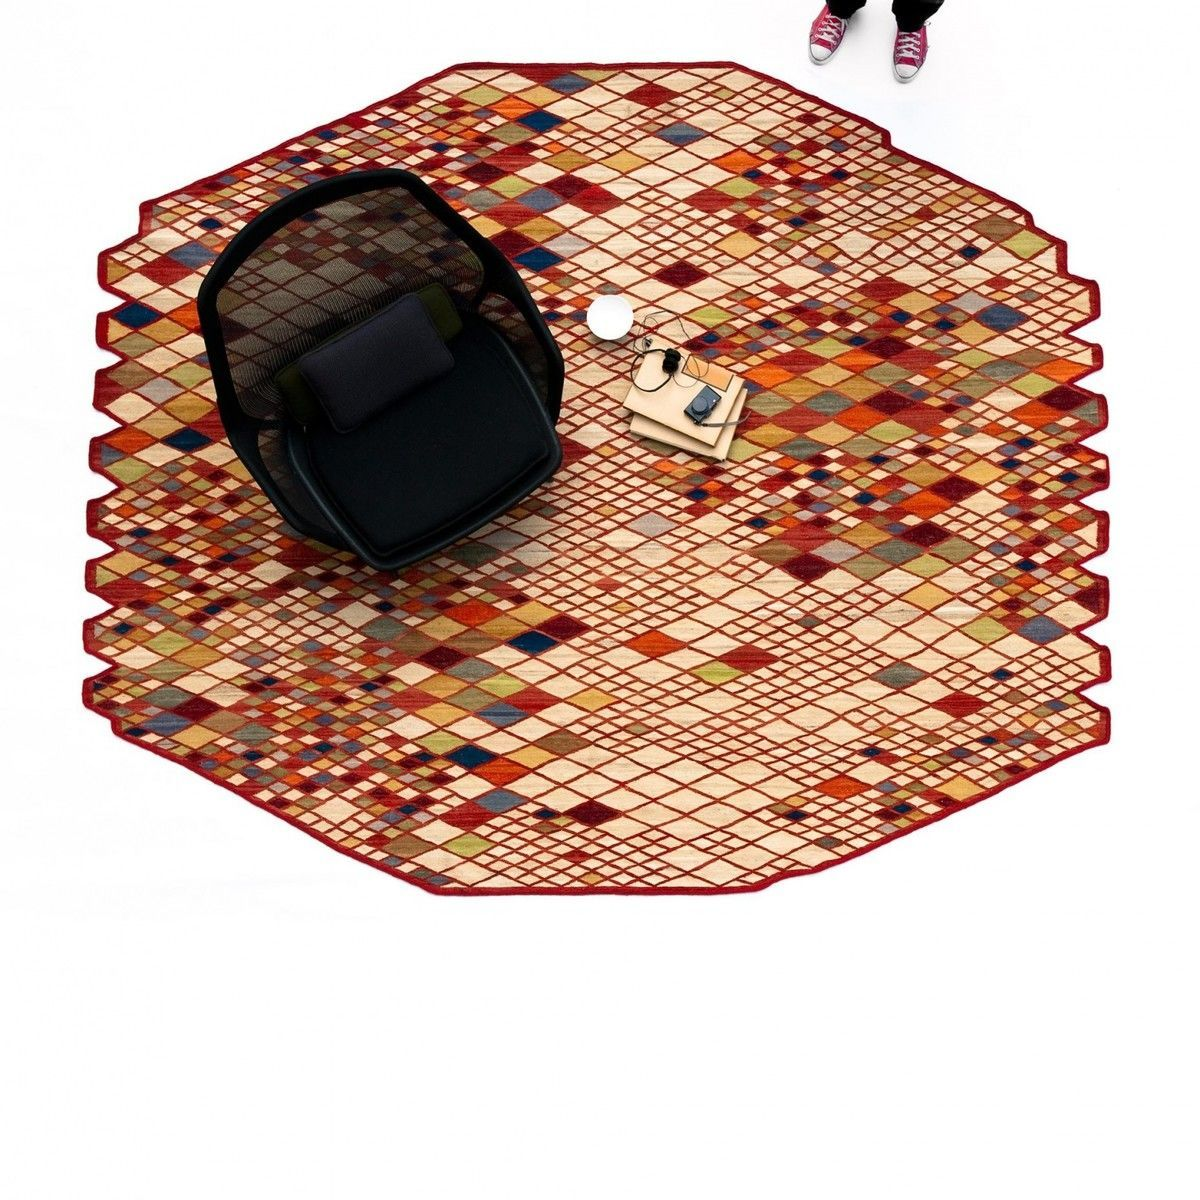 Losanges Bouroullec Design Teppich Nanimarquina